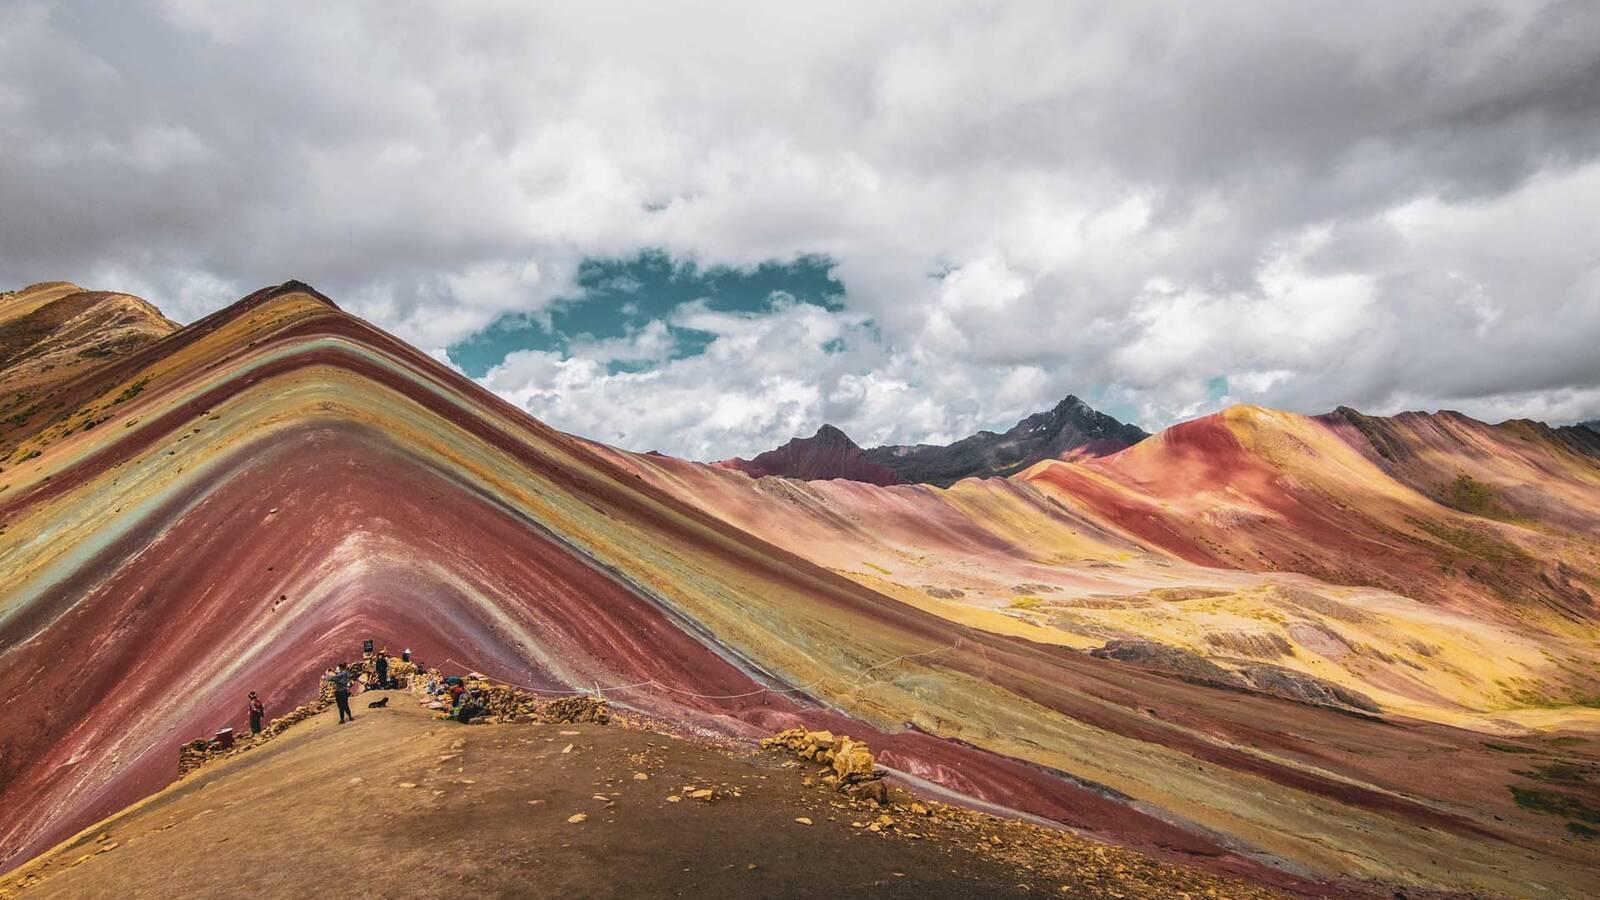 Perou cuzco montagnes multicolores